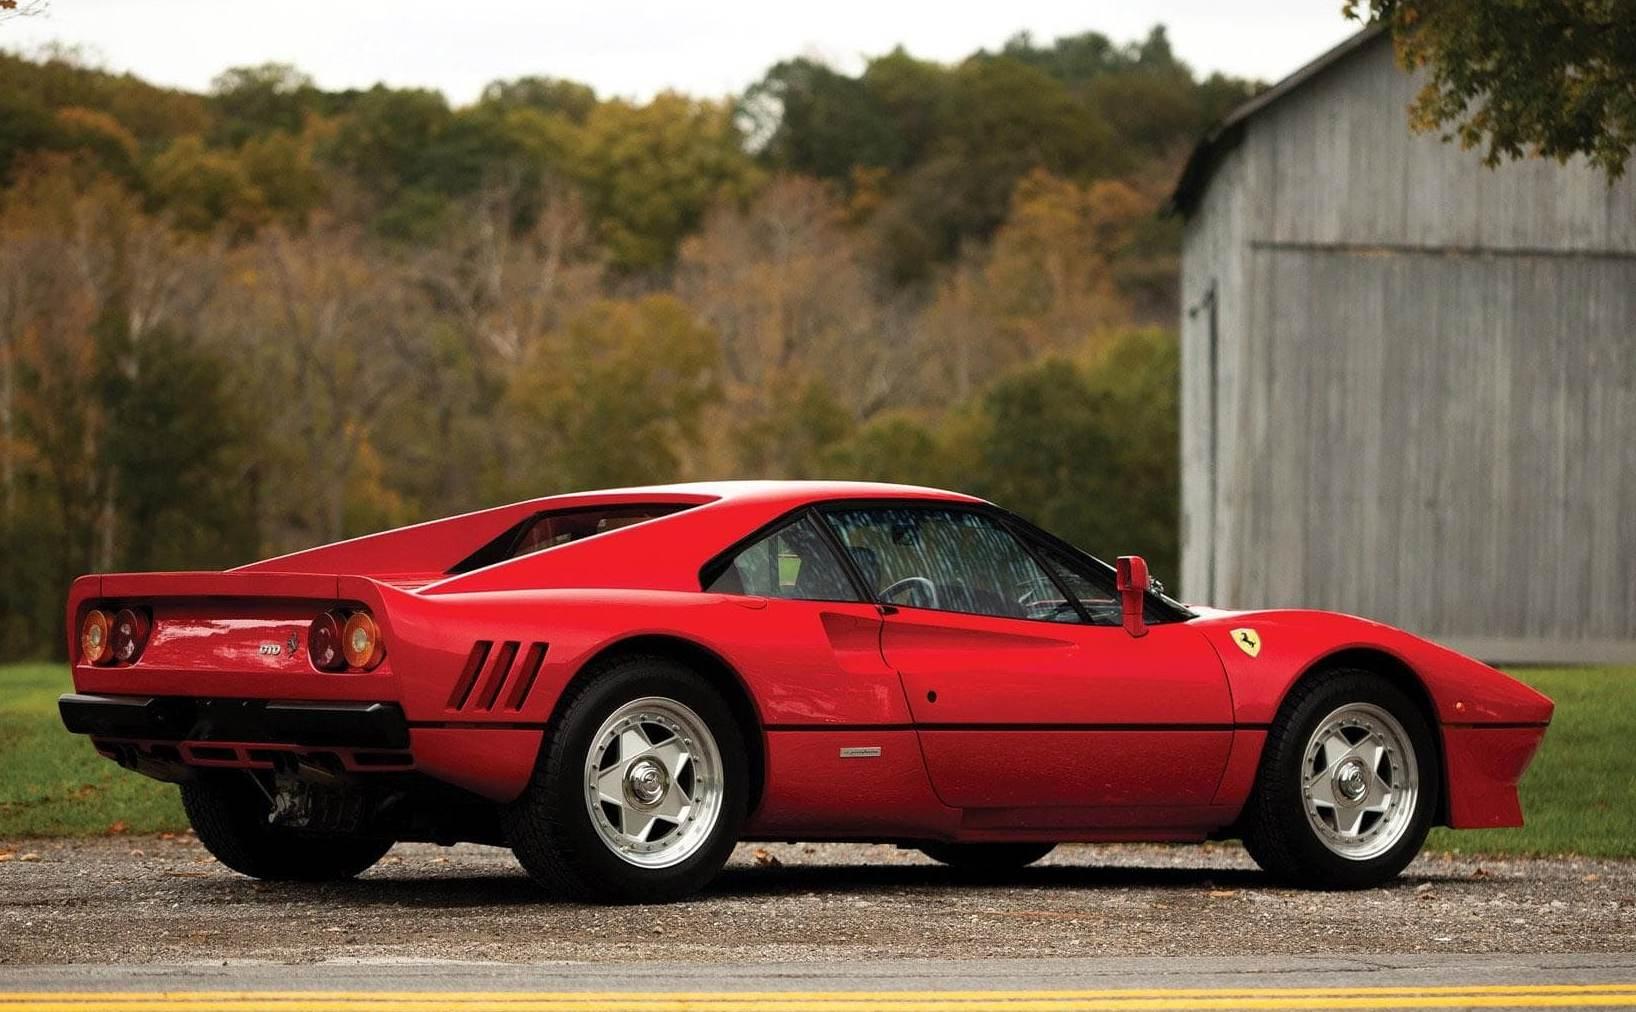 A thief sped off with ex-F1 diver Eddie Irvine's $3.8 million Ferrari during a test drive